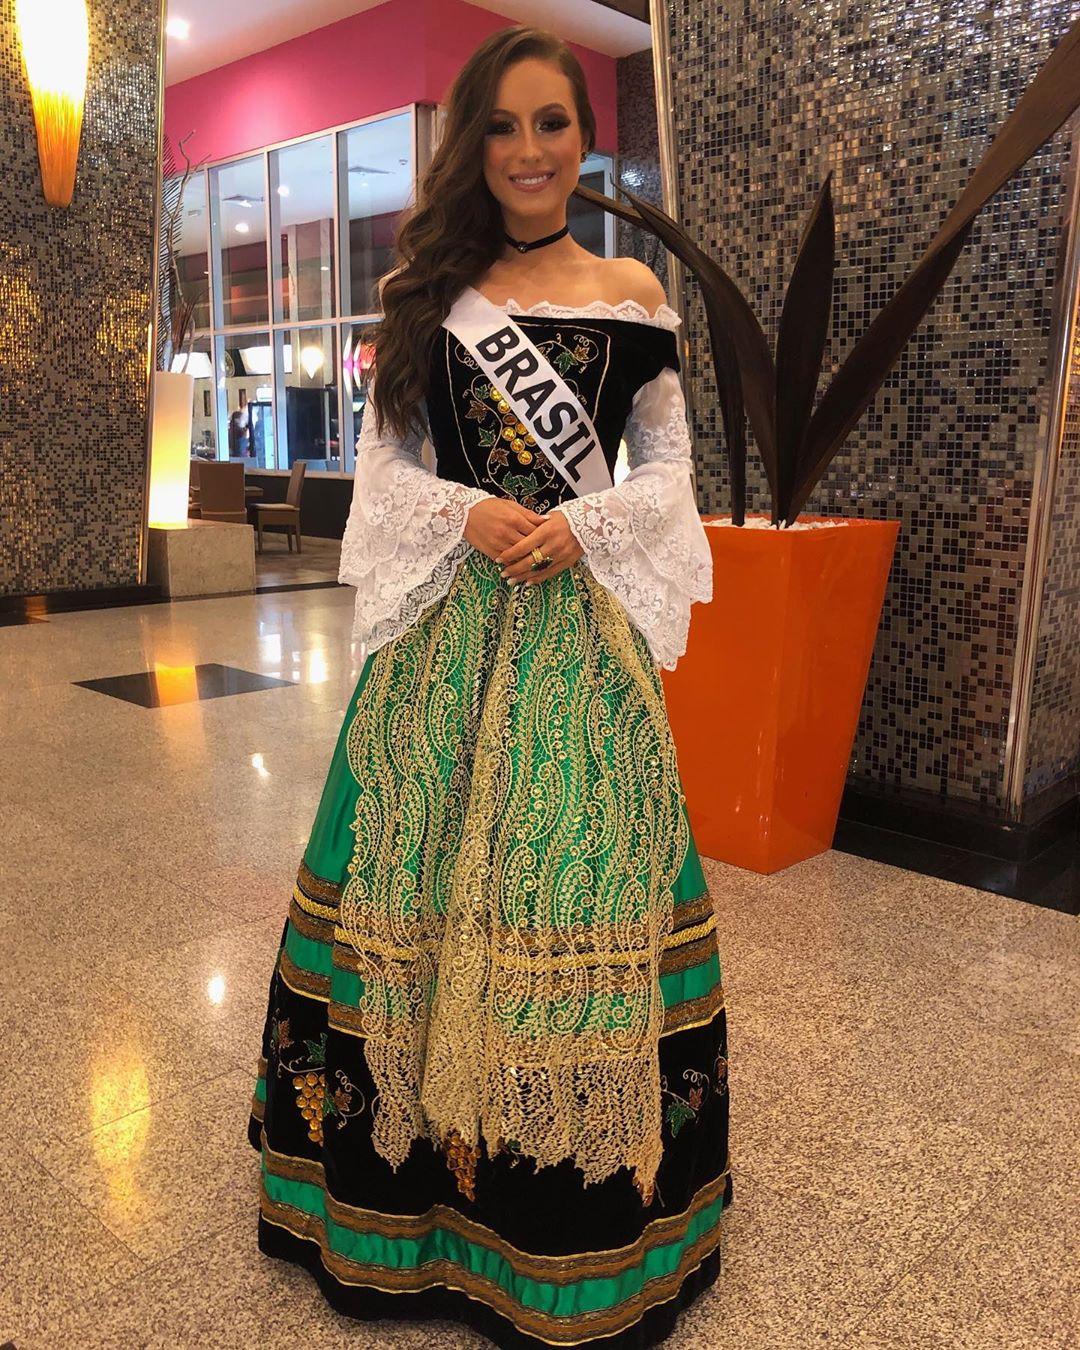 cristine boff sartor, segunda finalista de miss latinoamerica 2019. - Página 7 70125010